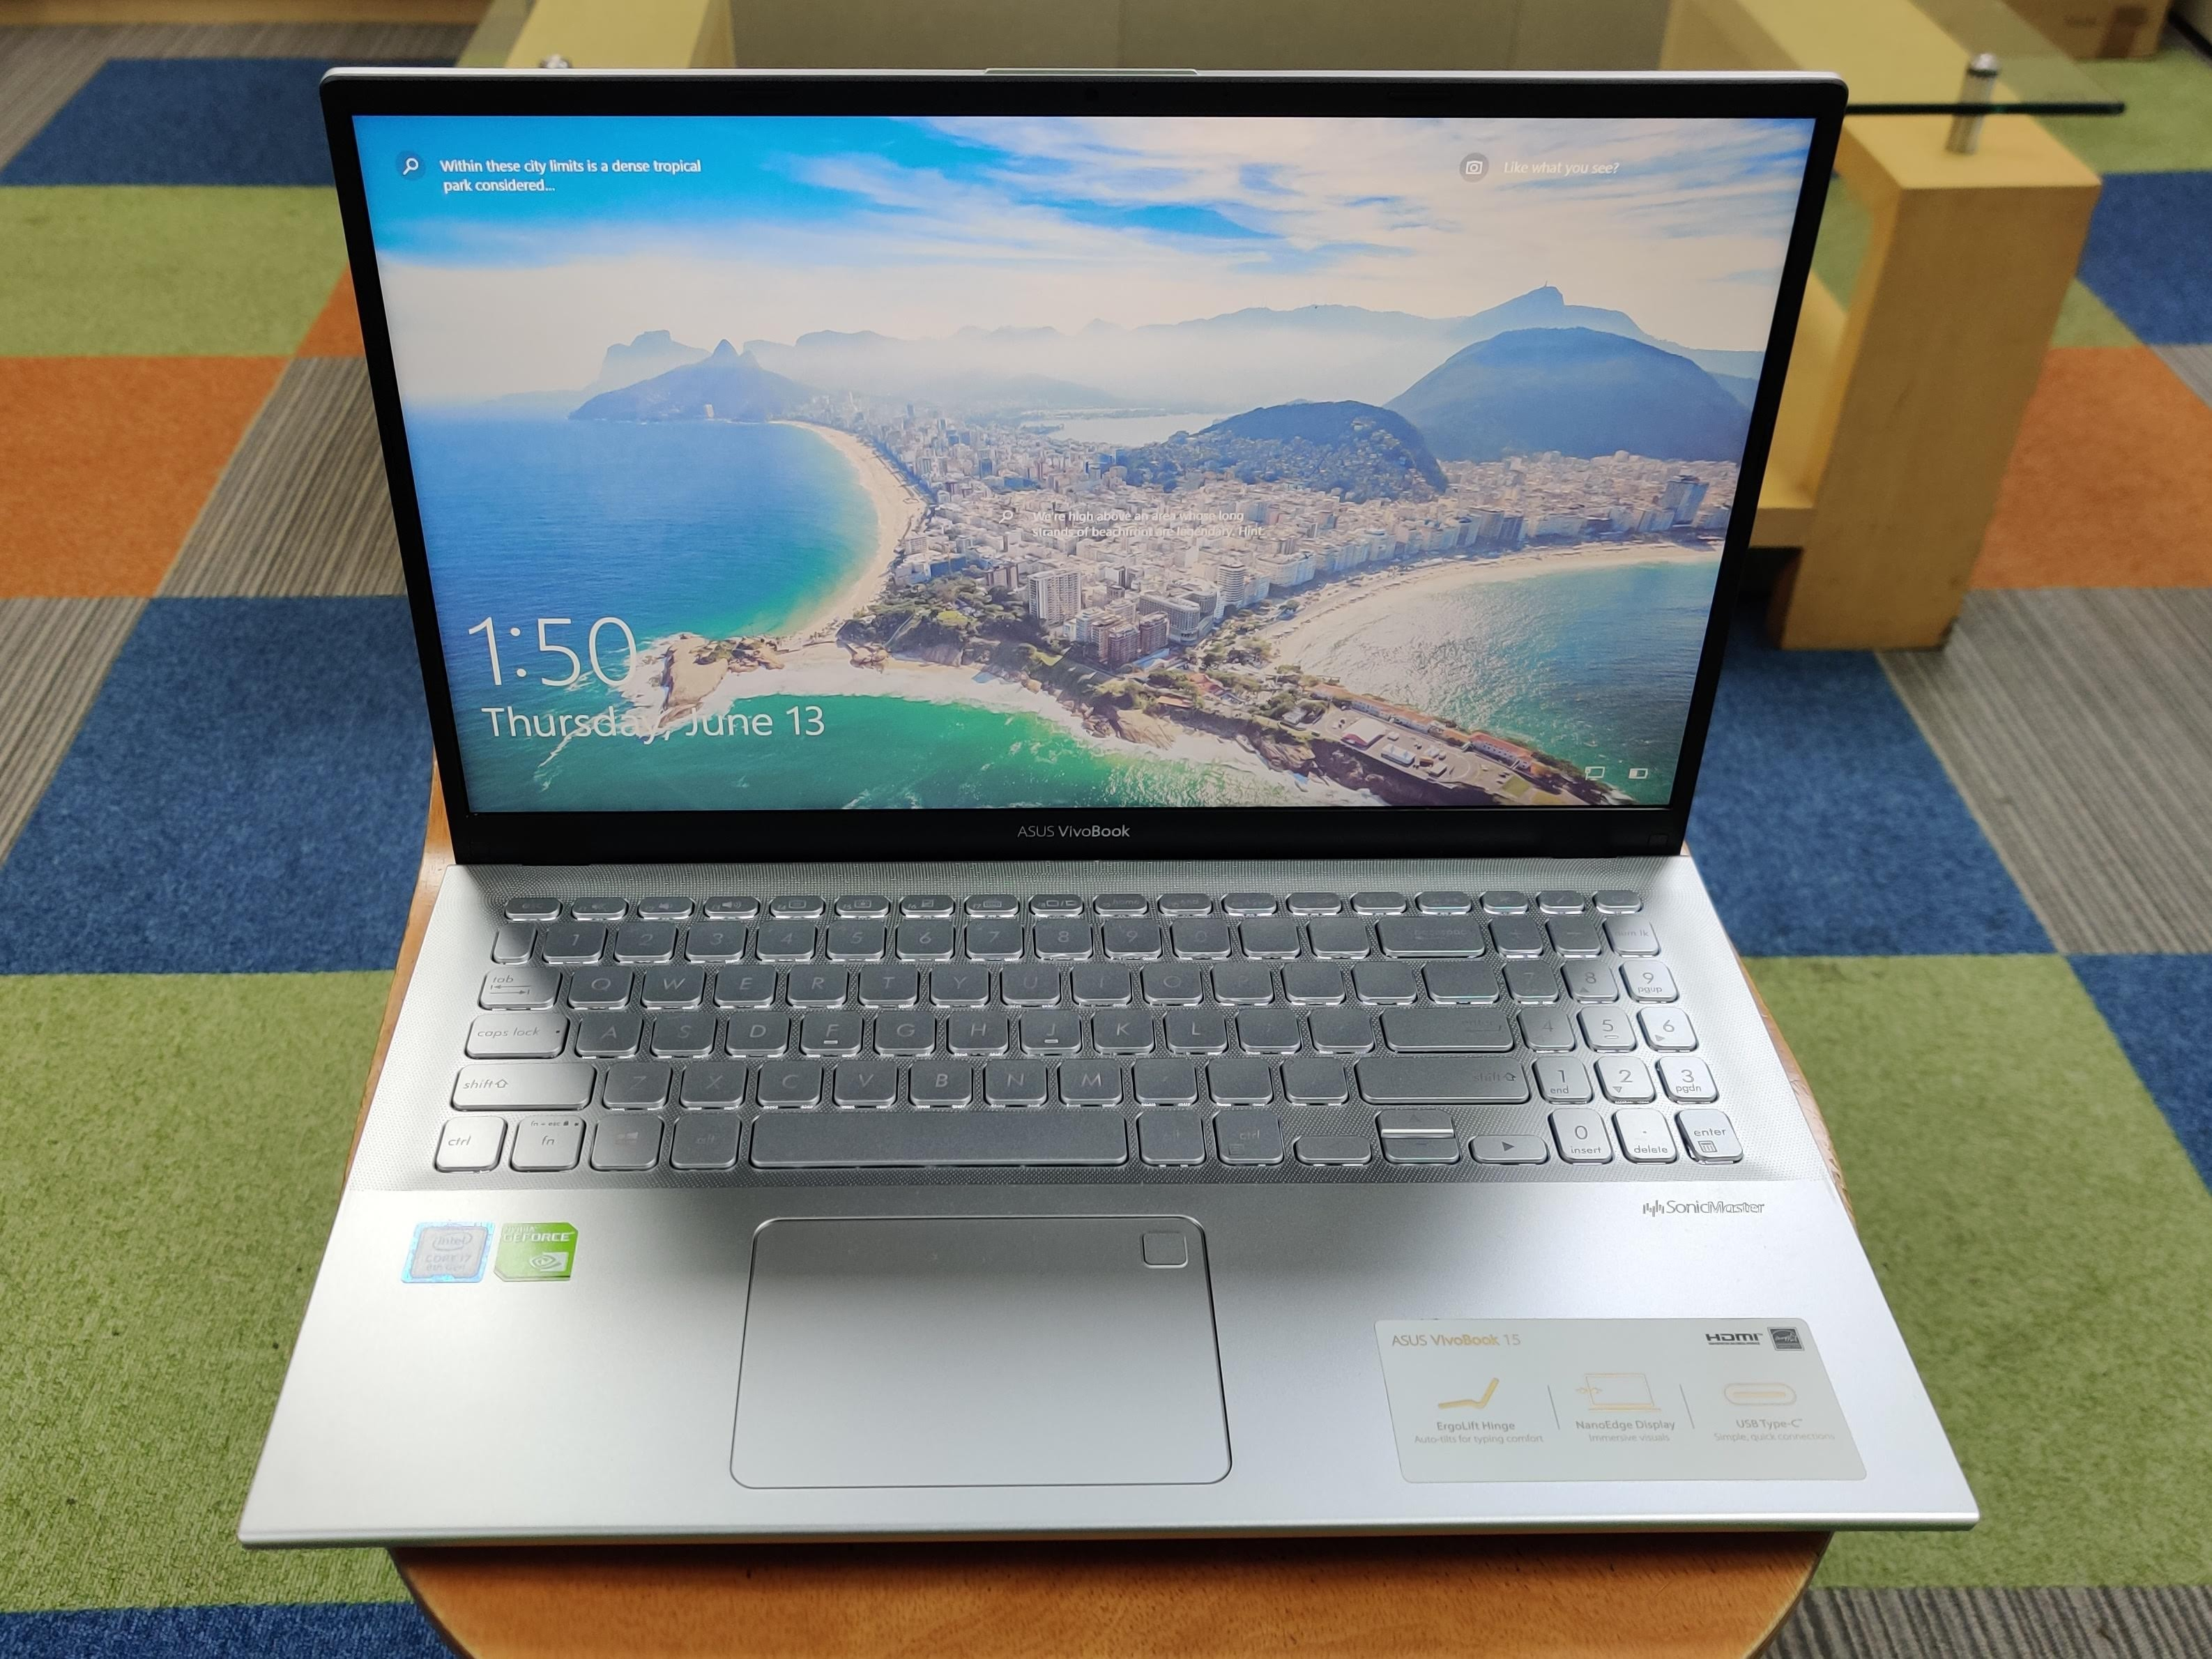 Asus Vivobook X512 Review Asus Vivobook 15 X512fl Ej201t Ultrabook Core I7 8th Gen 8 Gb 1 Tb 256 Gb Ssd Windows 10 2 Gb Review Asus Vivobook 15 X512fl Ej201t Ultrabook Core I7 8th Gen 8 Gb 1 Tb